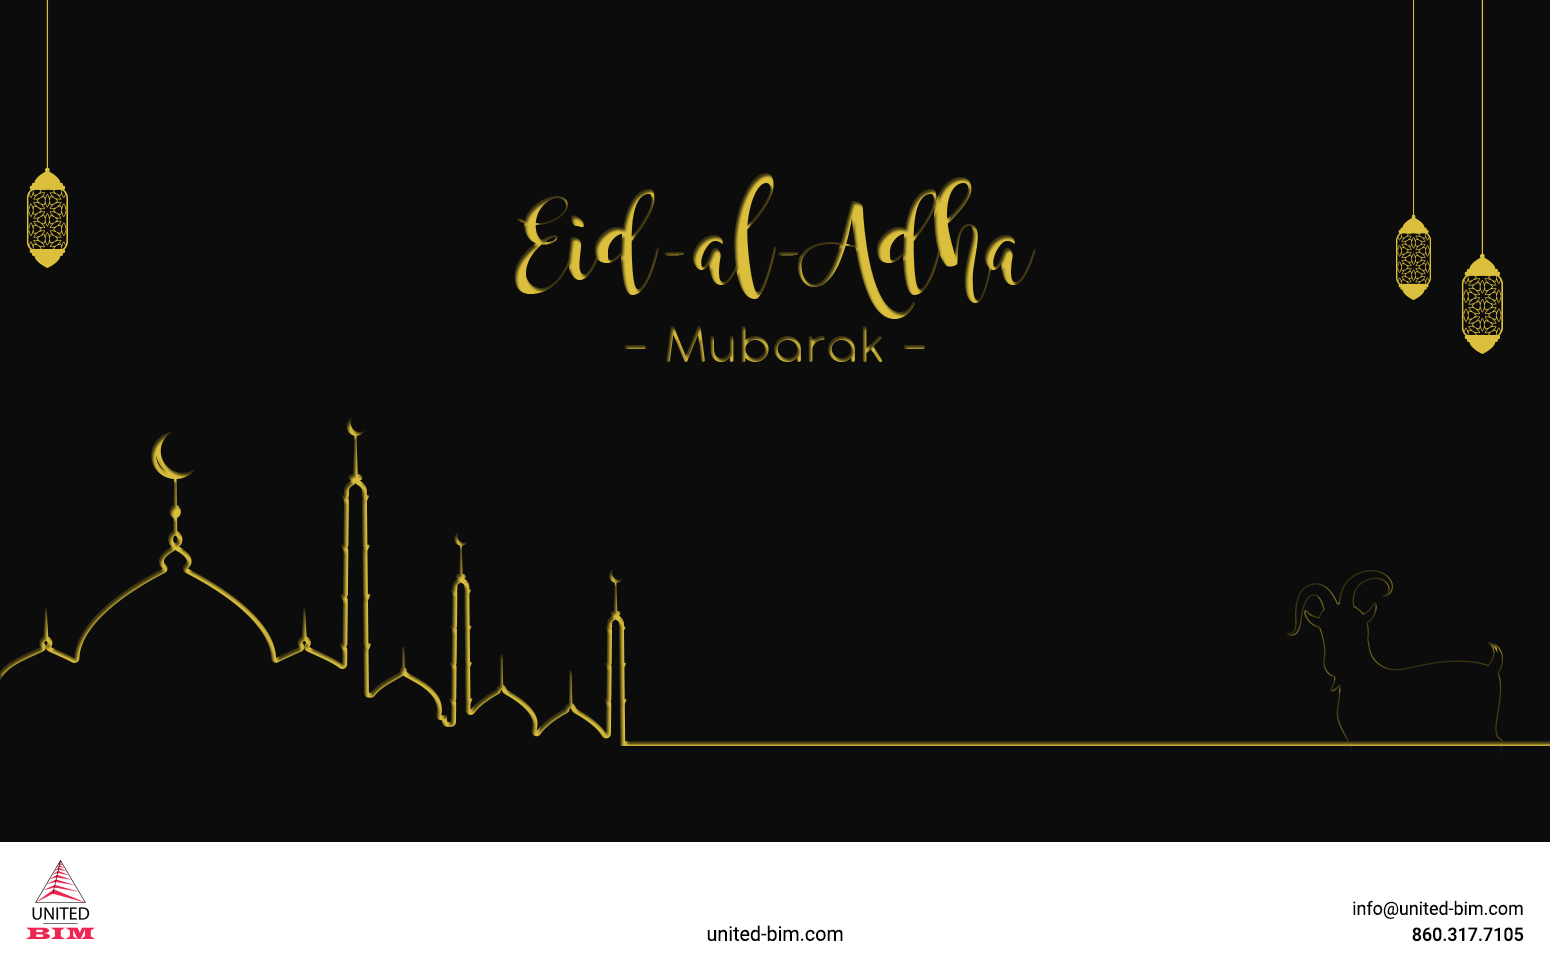 Eld Al Adha Mubarak_2021_Graphic by United-BIM